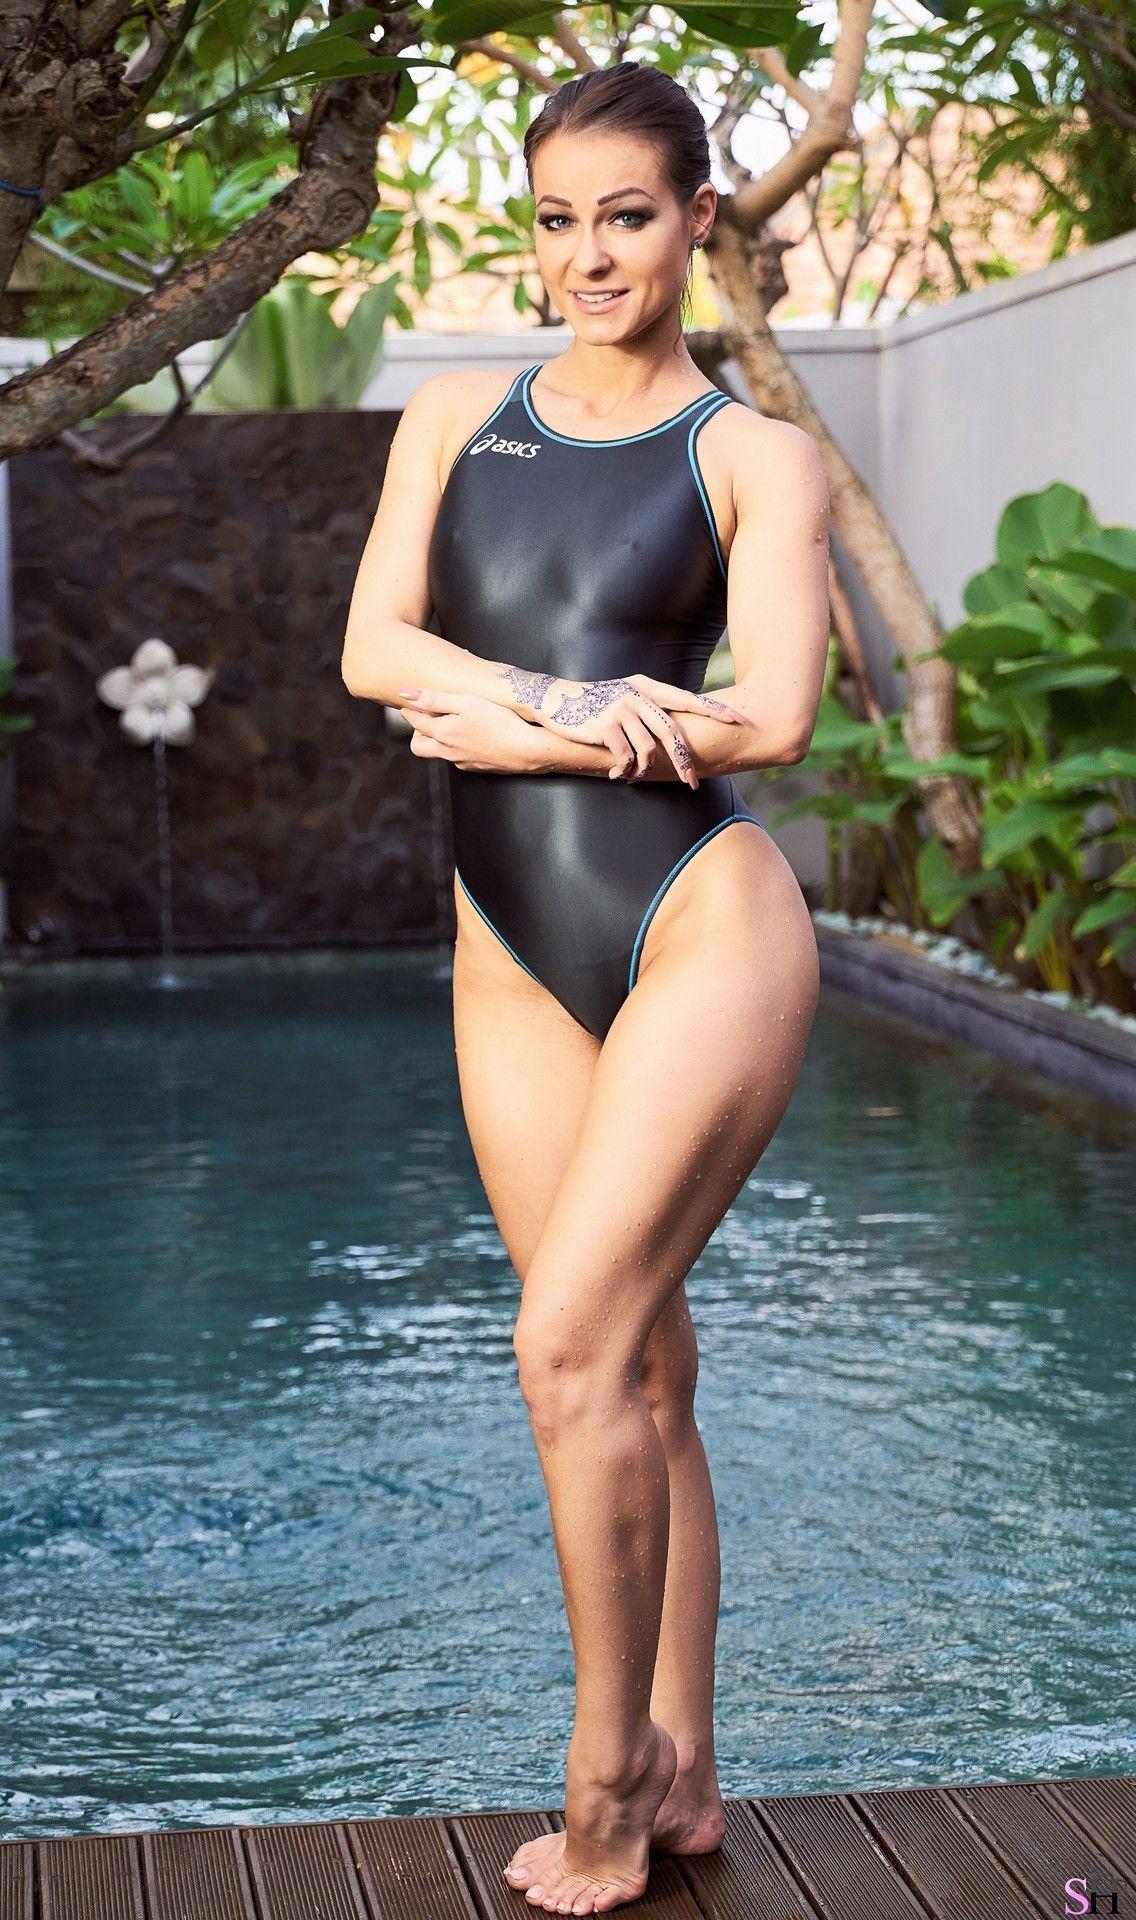 Melissa Mendiny Wetsuit, Bikini Beach, Most Beautiful Women, Swimsuits,  Volcanoes, Swimsuit 20aabc038e